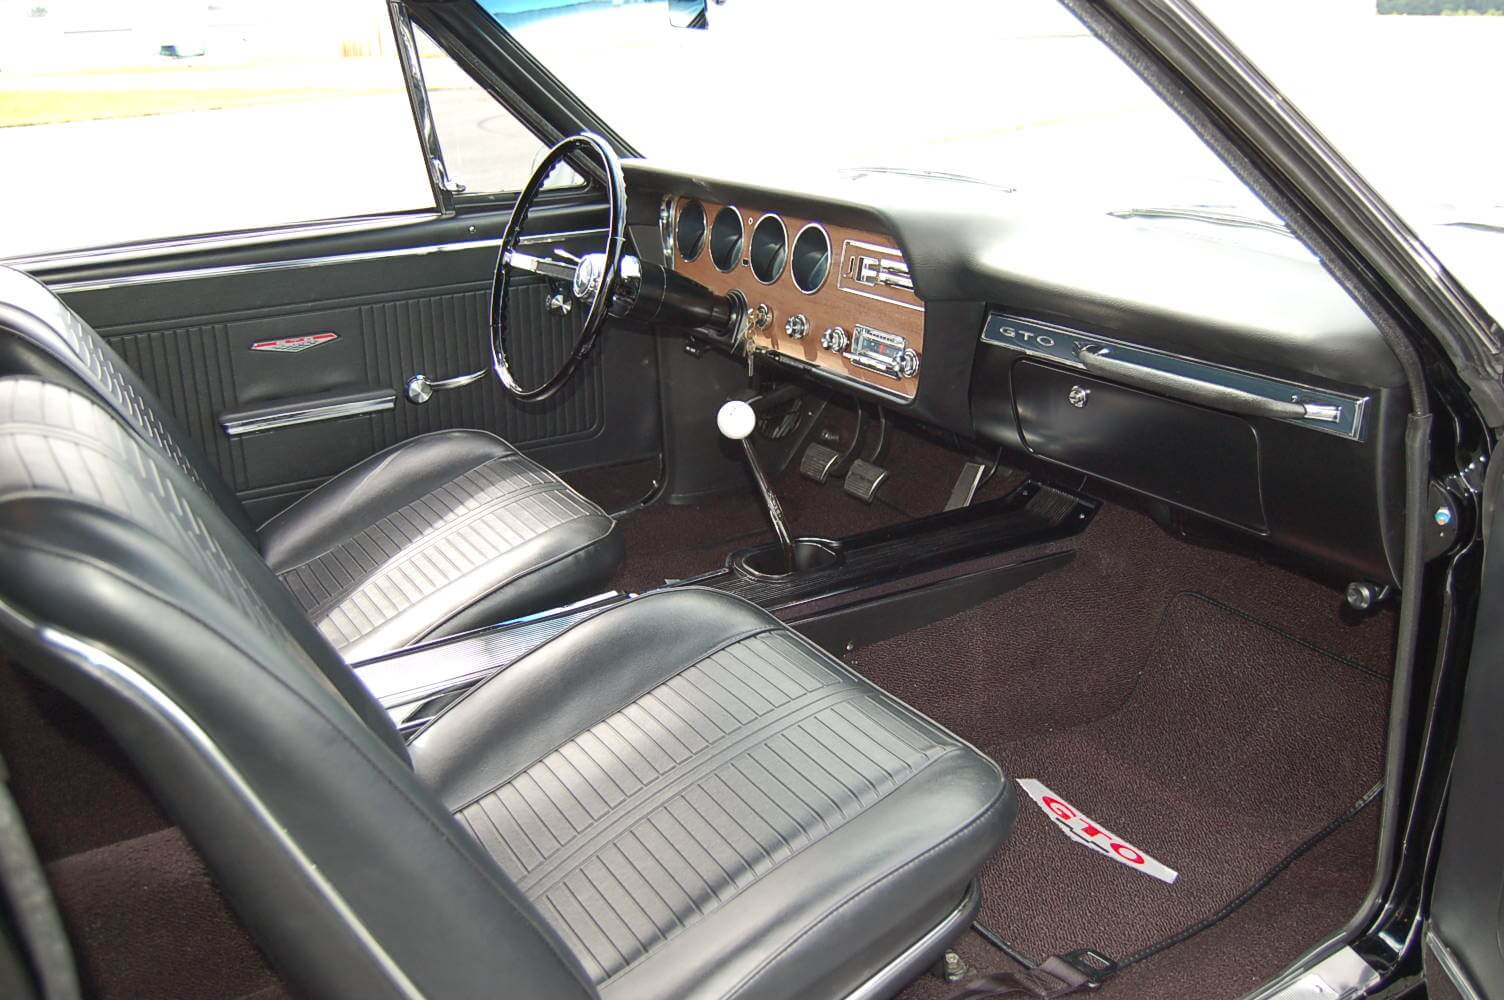 1966 GTO Interior.JPG